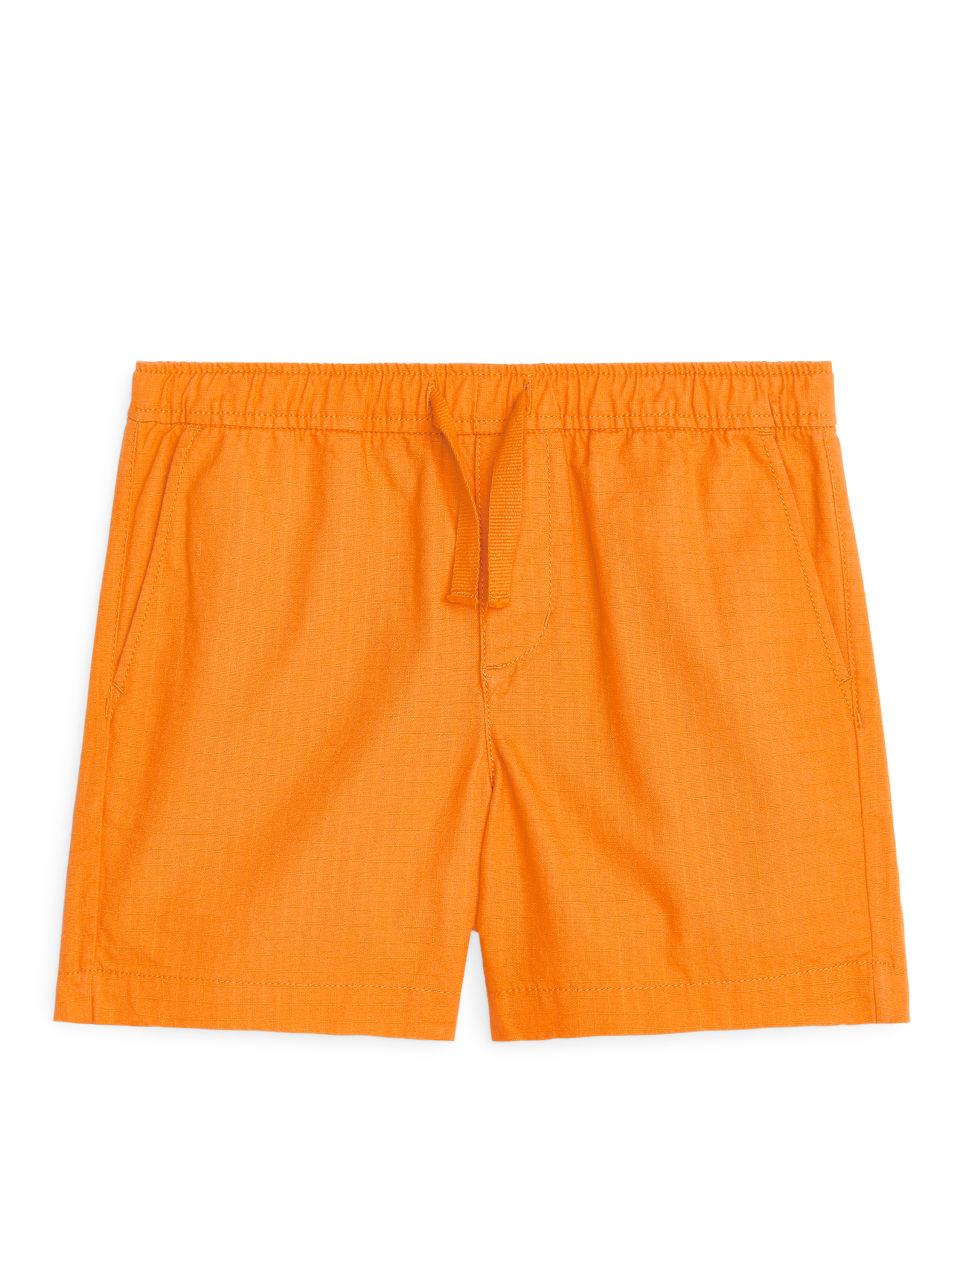 Drawstring Shorts - Orange